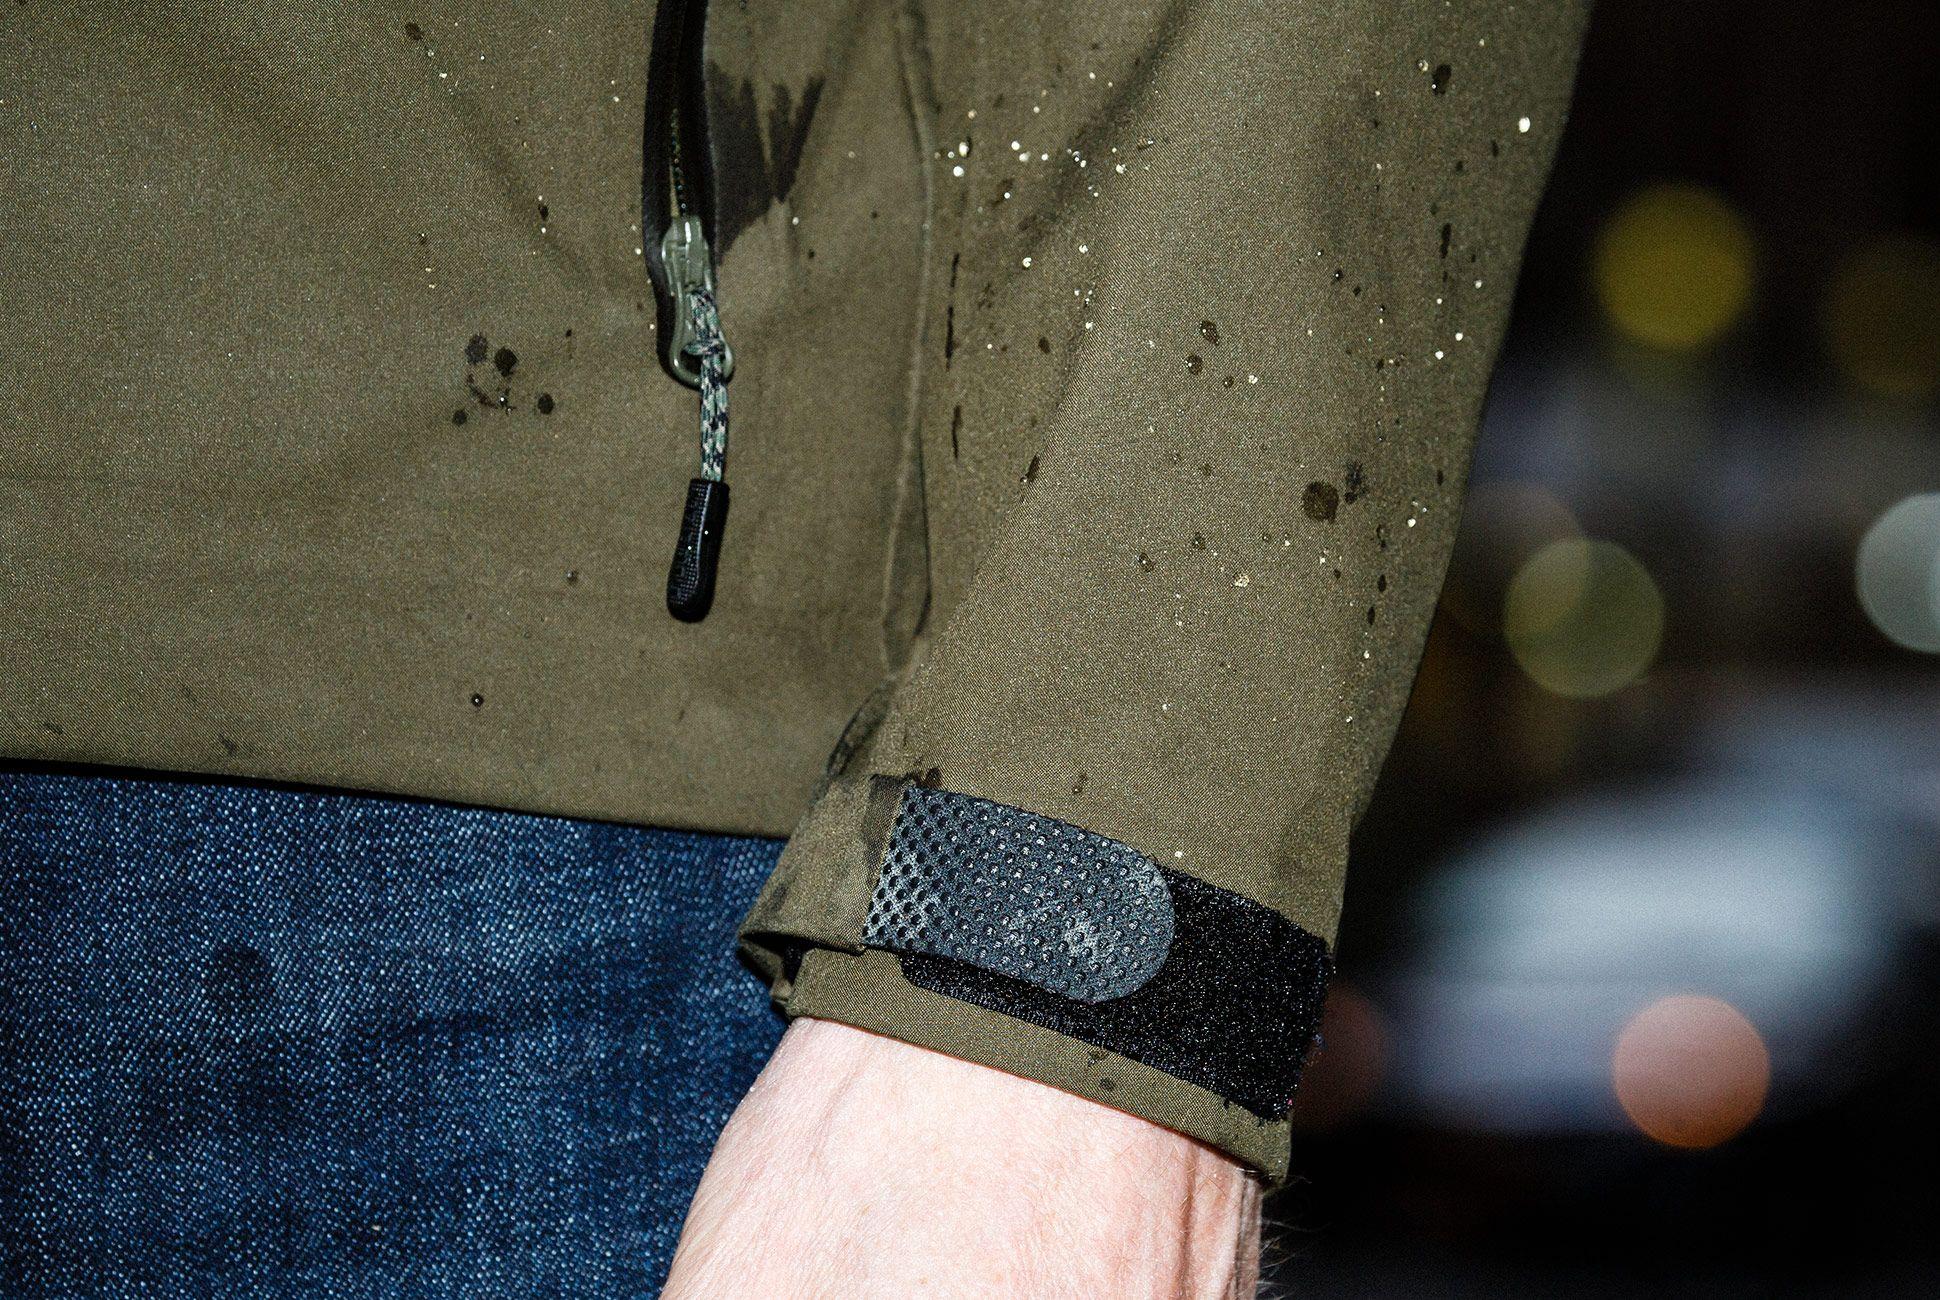 Filson-Neoshell-Reliance-Rainjacket-gear-patrol-slide-5